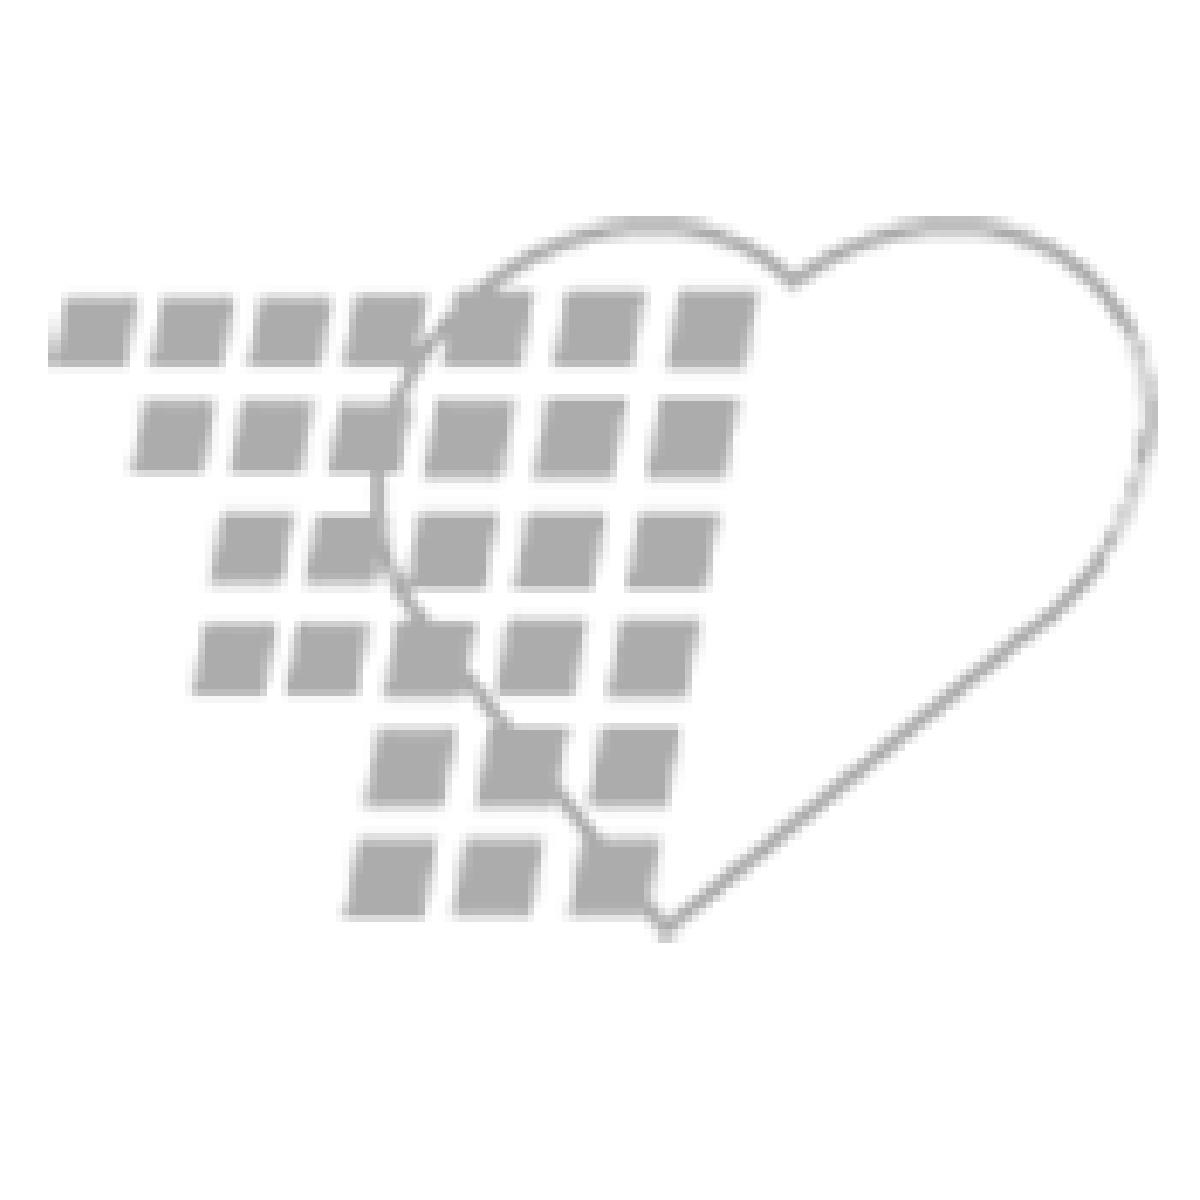 06-93-3103 Demo Dose® Nitr Sublingual Tablets 0.4 mg,